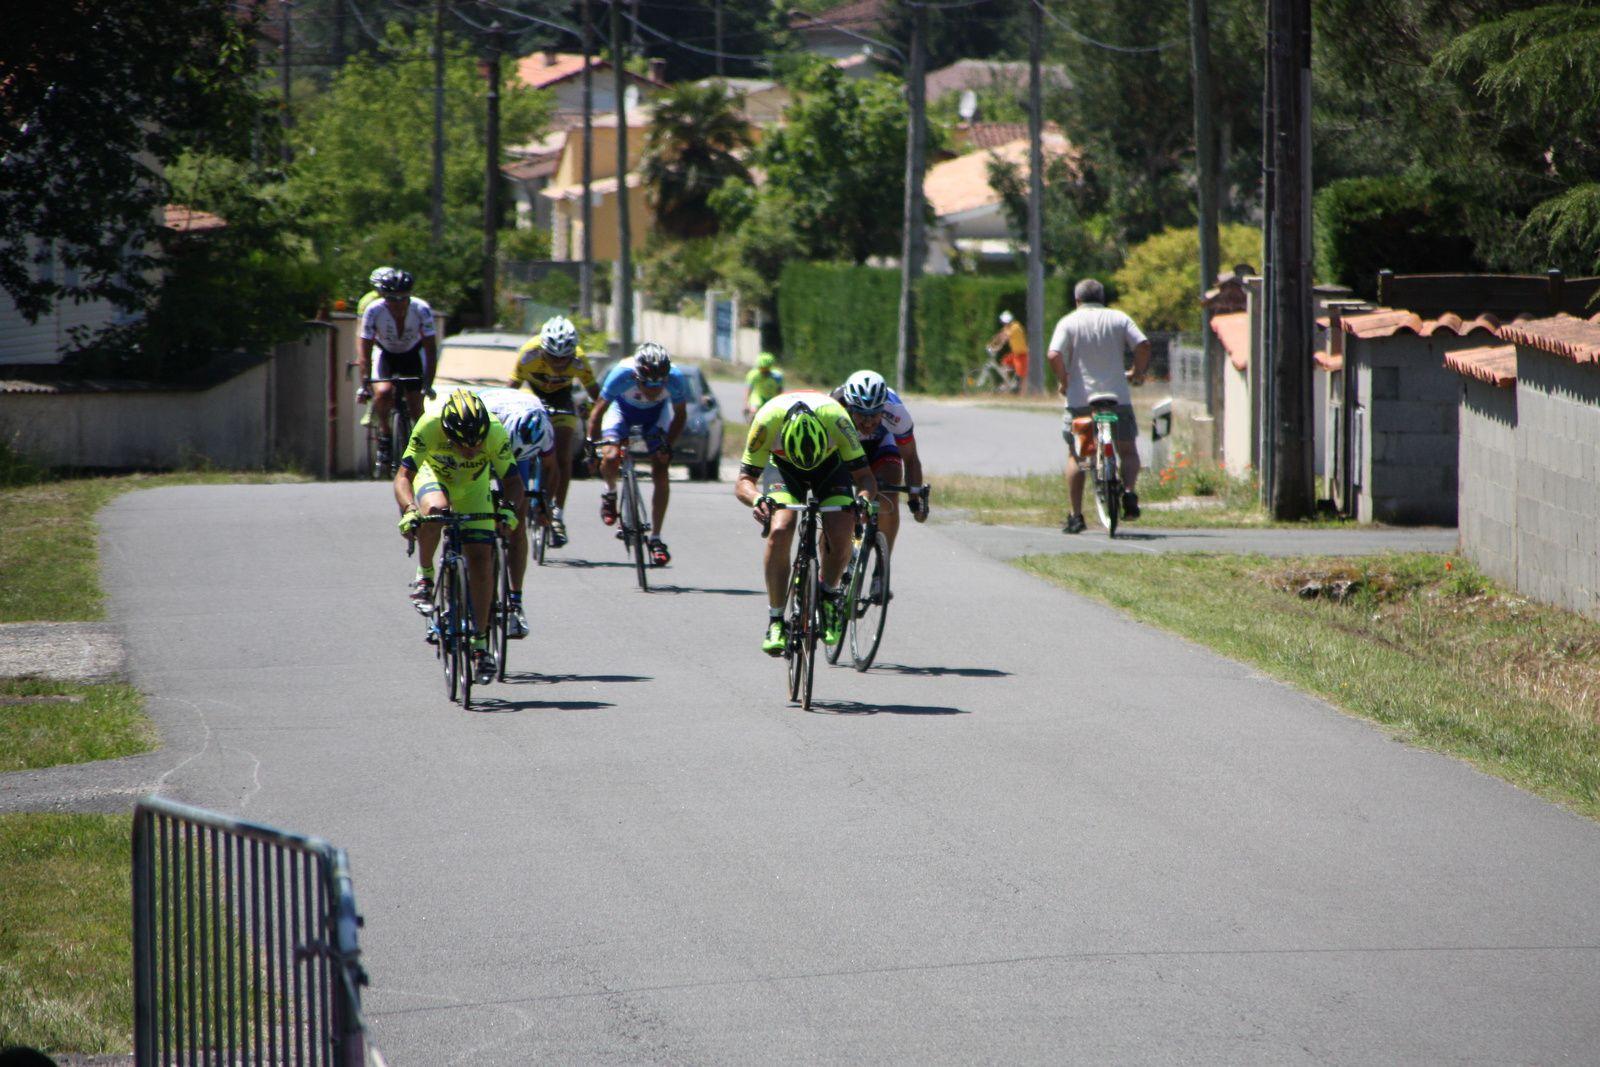 2e  Christophe  LANDRY(EC 3M), 3e   Bernard  VERMOOTE(EC  Foyenne),  4e  Christophe  DAVIAUD(R  Guataise), 5e  Jean-Jacques  SKOLNIK(AVC  Libourne),6e  Didier  PASTUREAU(SA  Mussidan), 7e  Jean-Claude  VERREKEN(VC  Le Gua), 8e  Patrick  DENIAU(P  St  Florent)